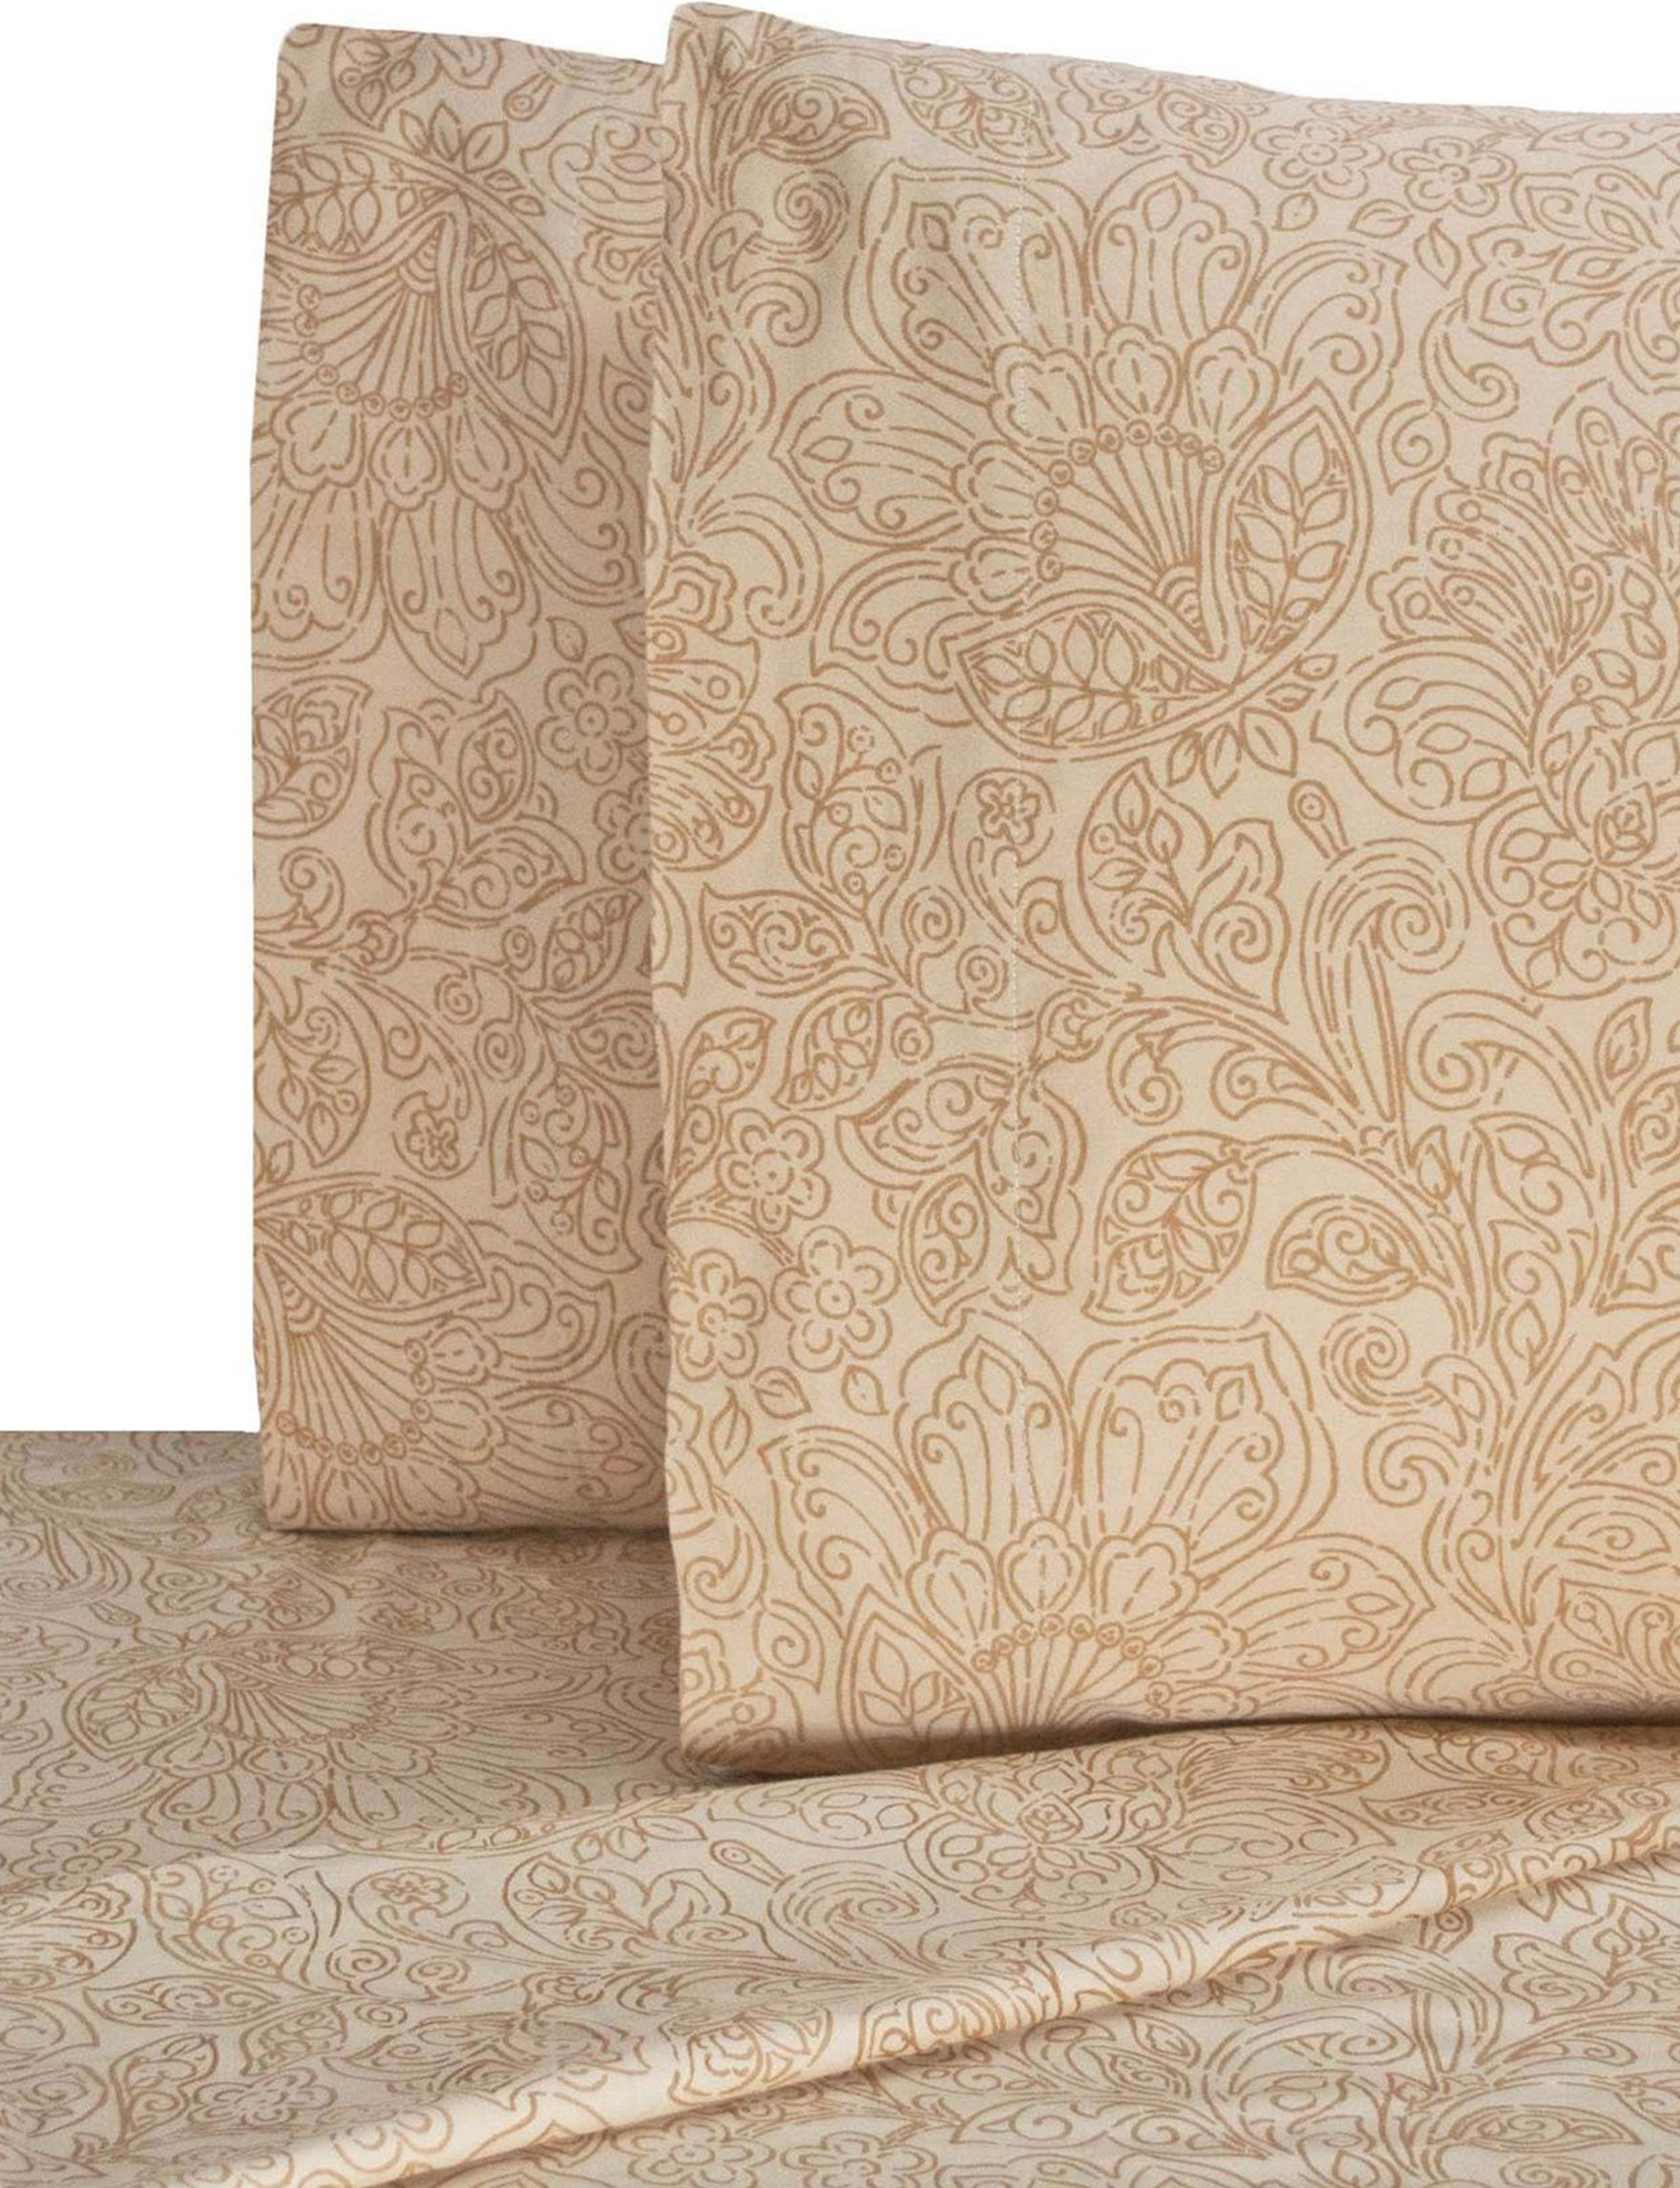 V1969 Ivory Sheets & Pillowcases